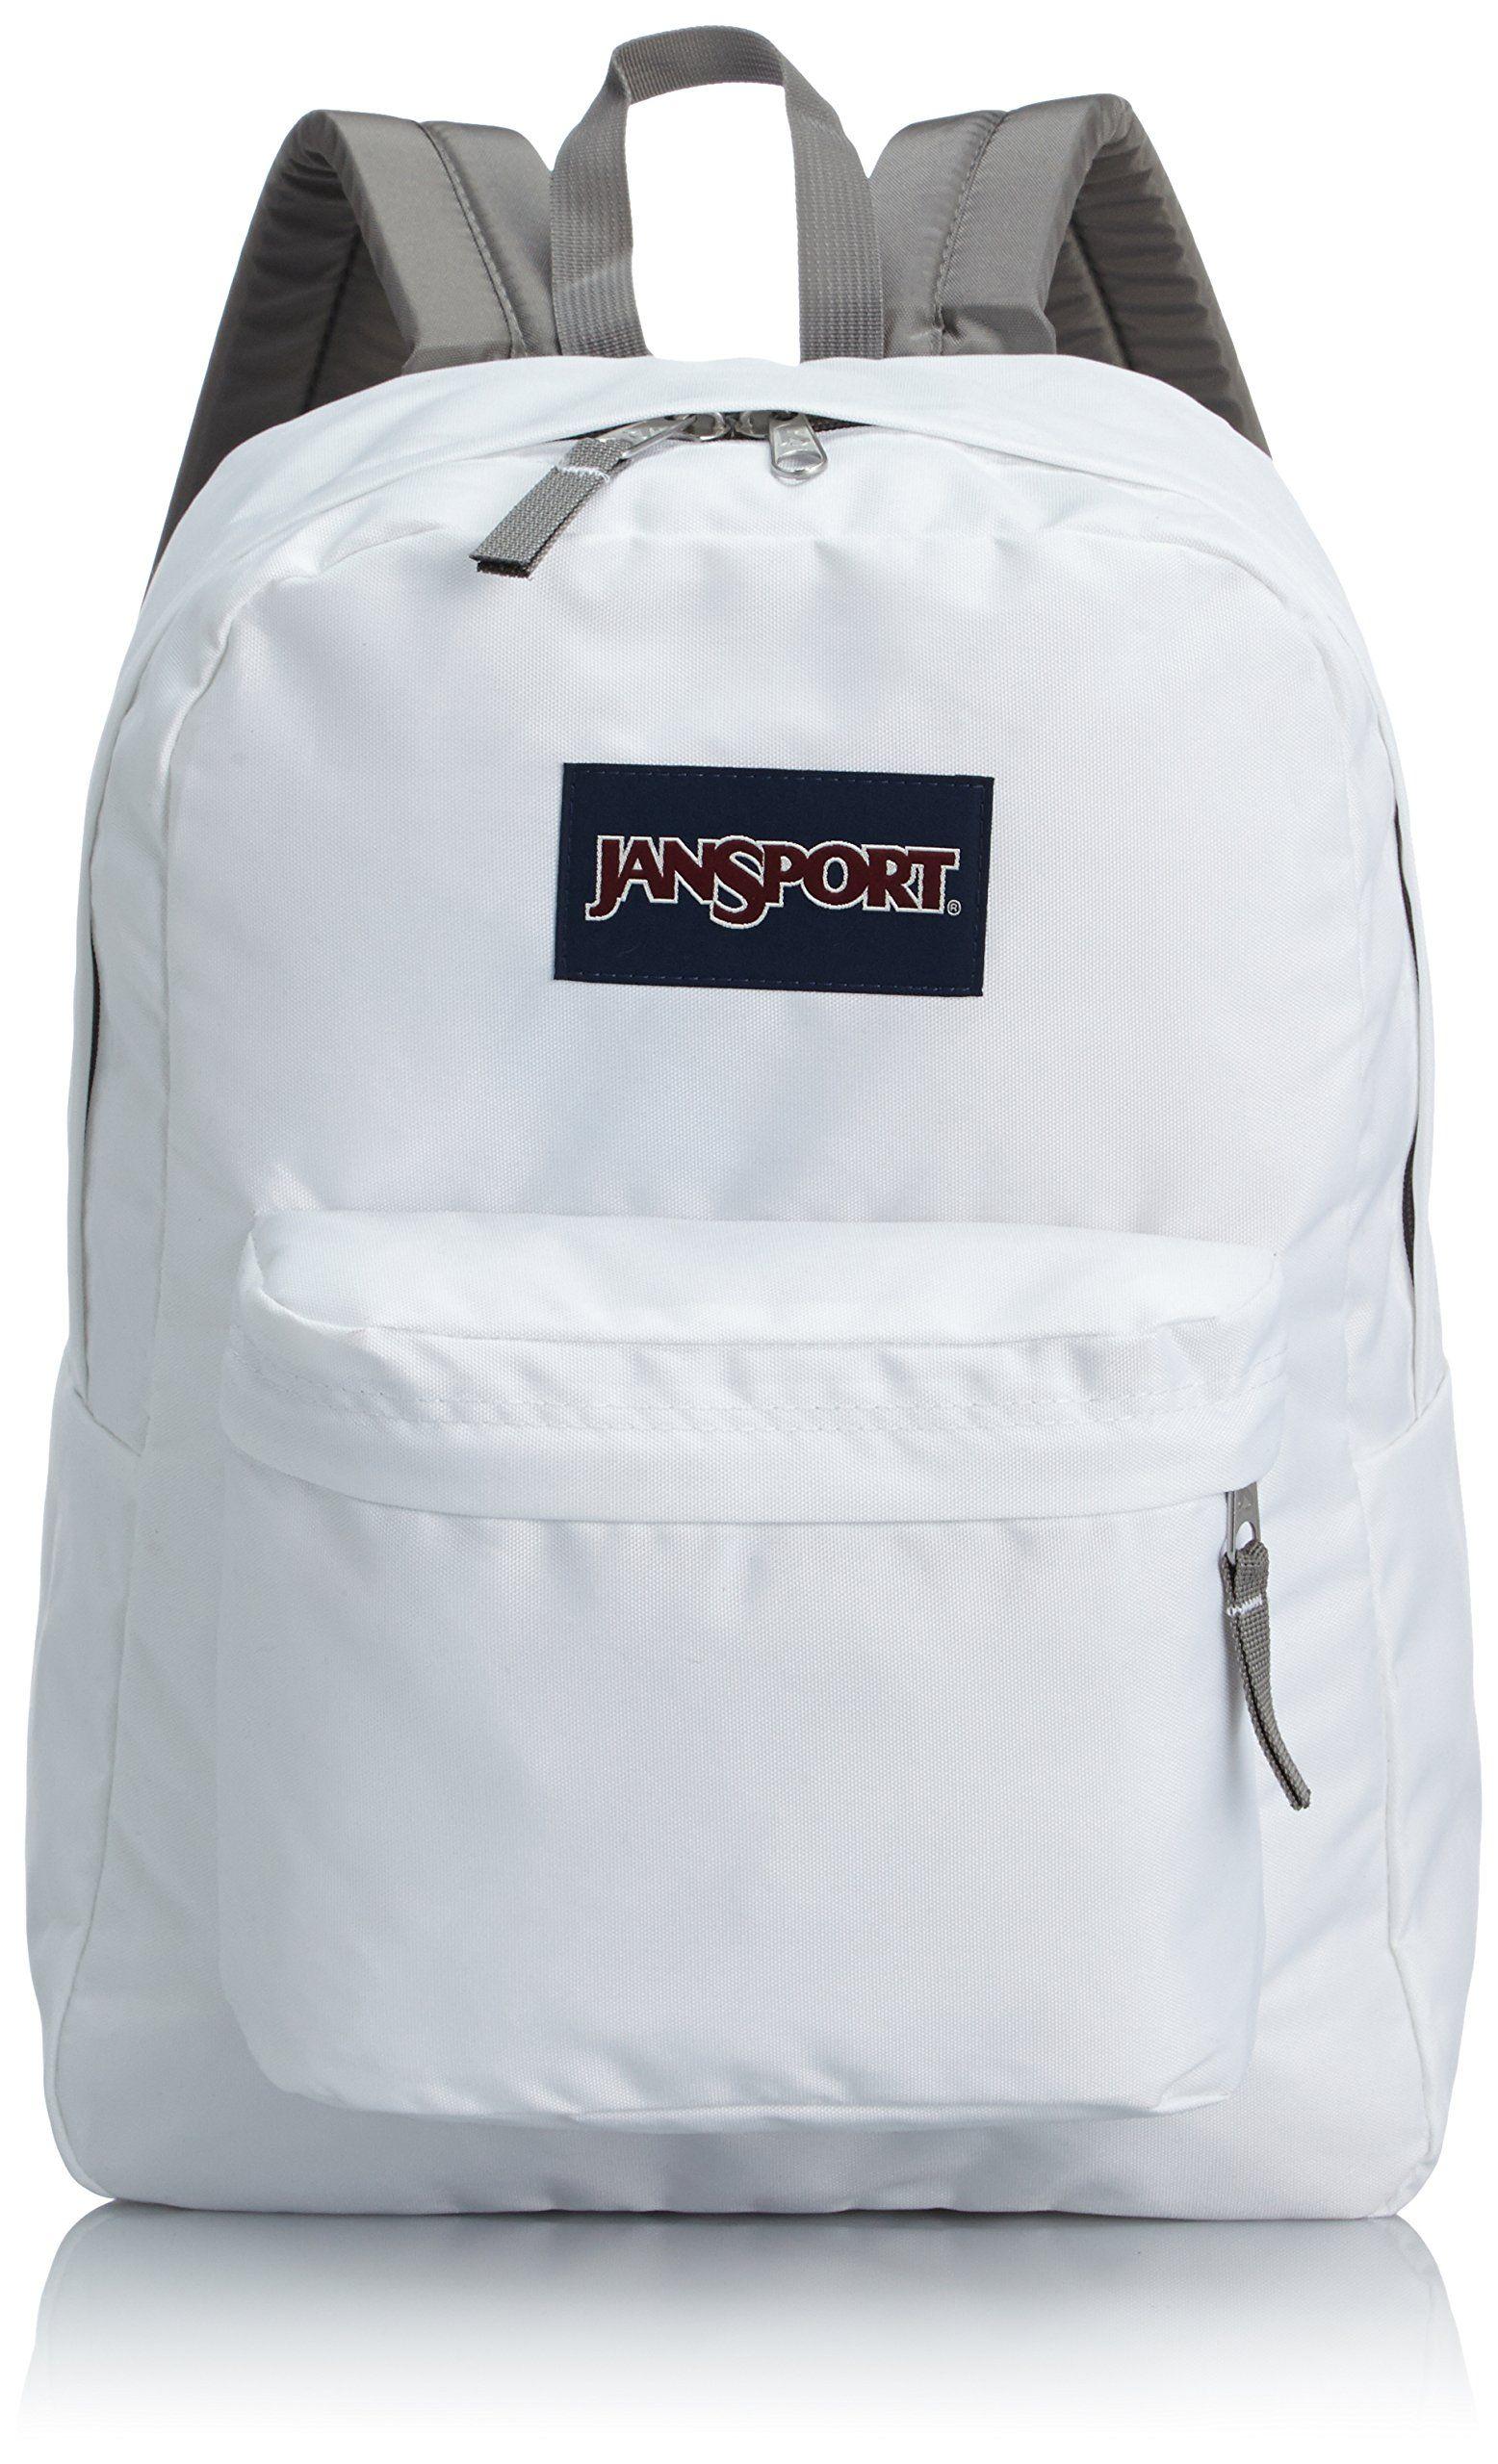 Amazon.com  Jansport Superbreak Backpack (White)  Jansport  Clothing   student  bags  travel b5c95275b3280